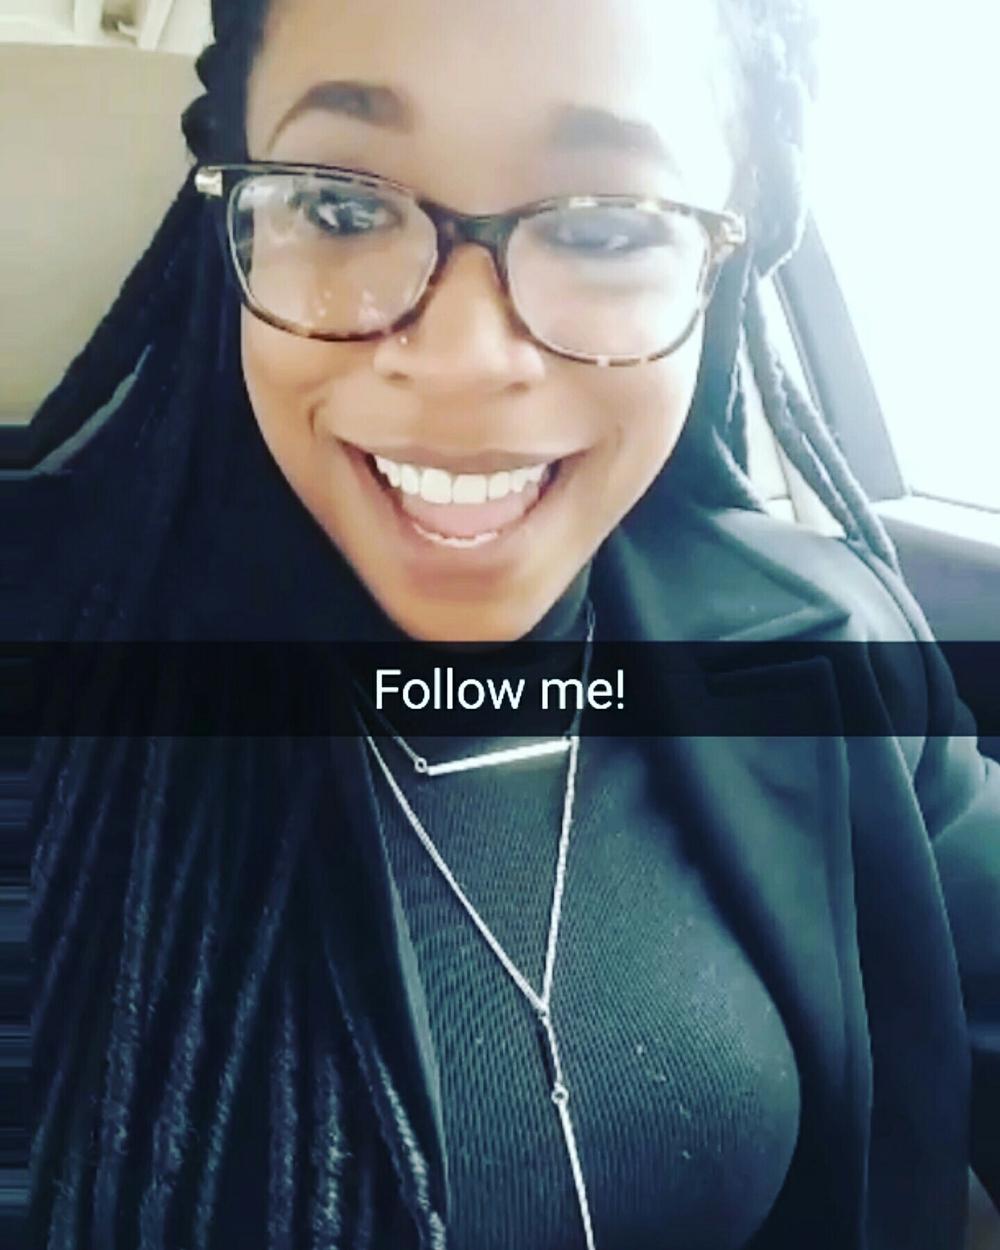 follow me! @nvd_envied